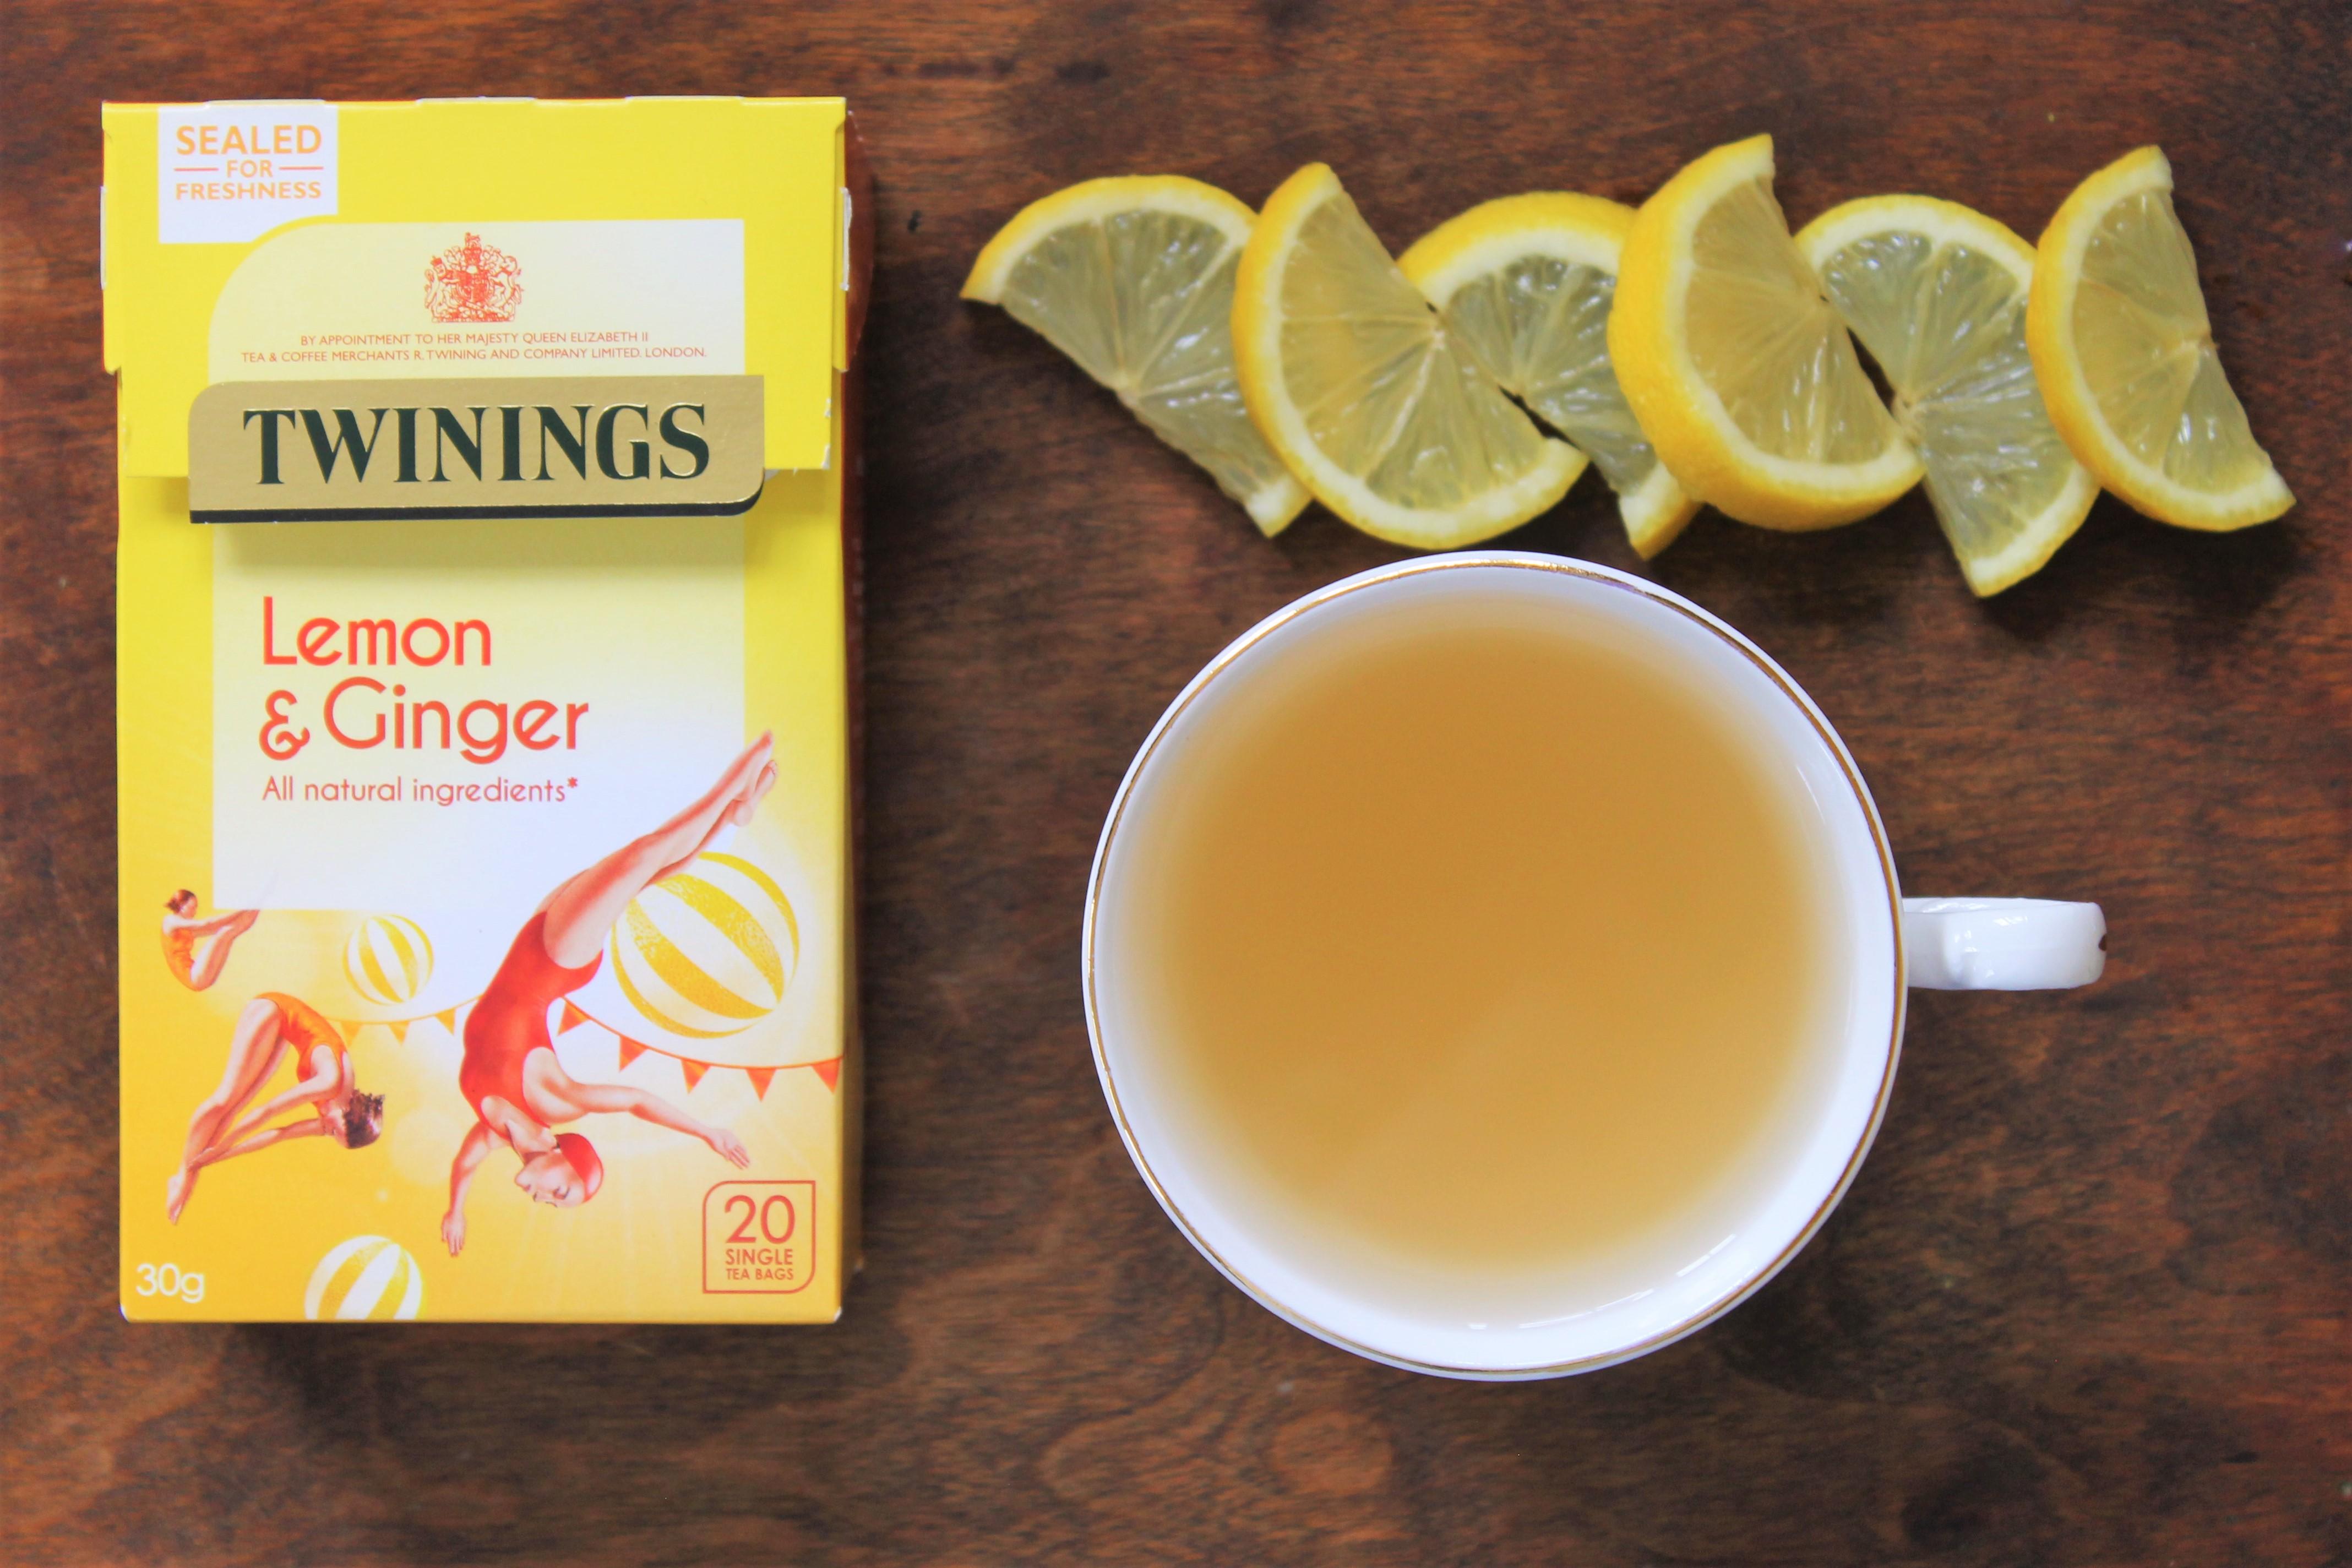 Twinings Lemon & Ginger Tea Review